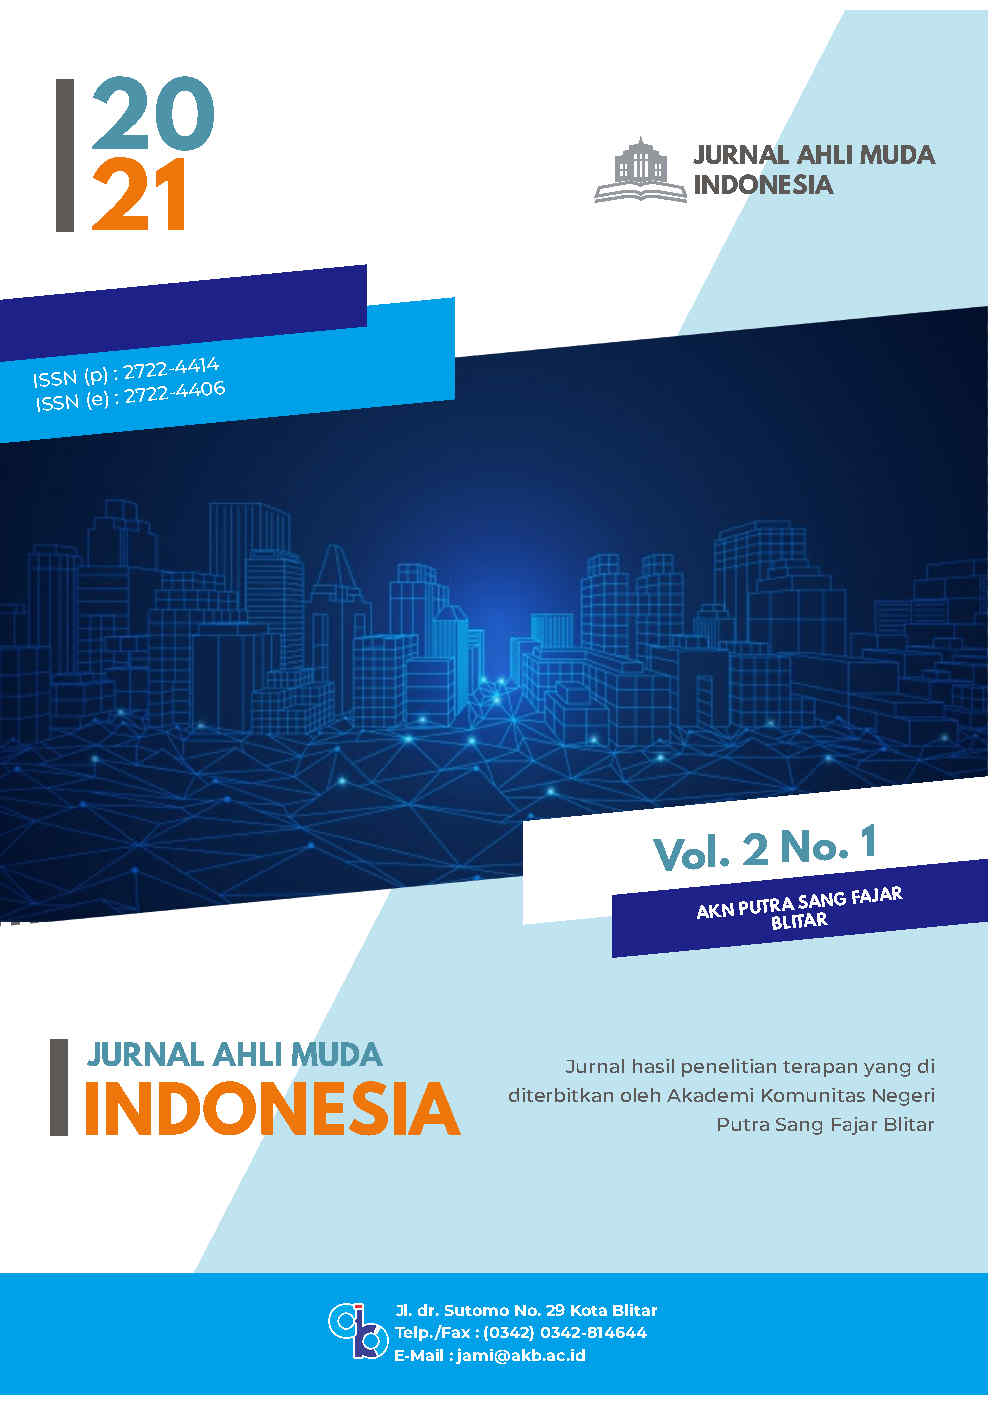 JAMI : Jurnal Ahli Muda Indonesia